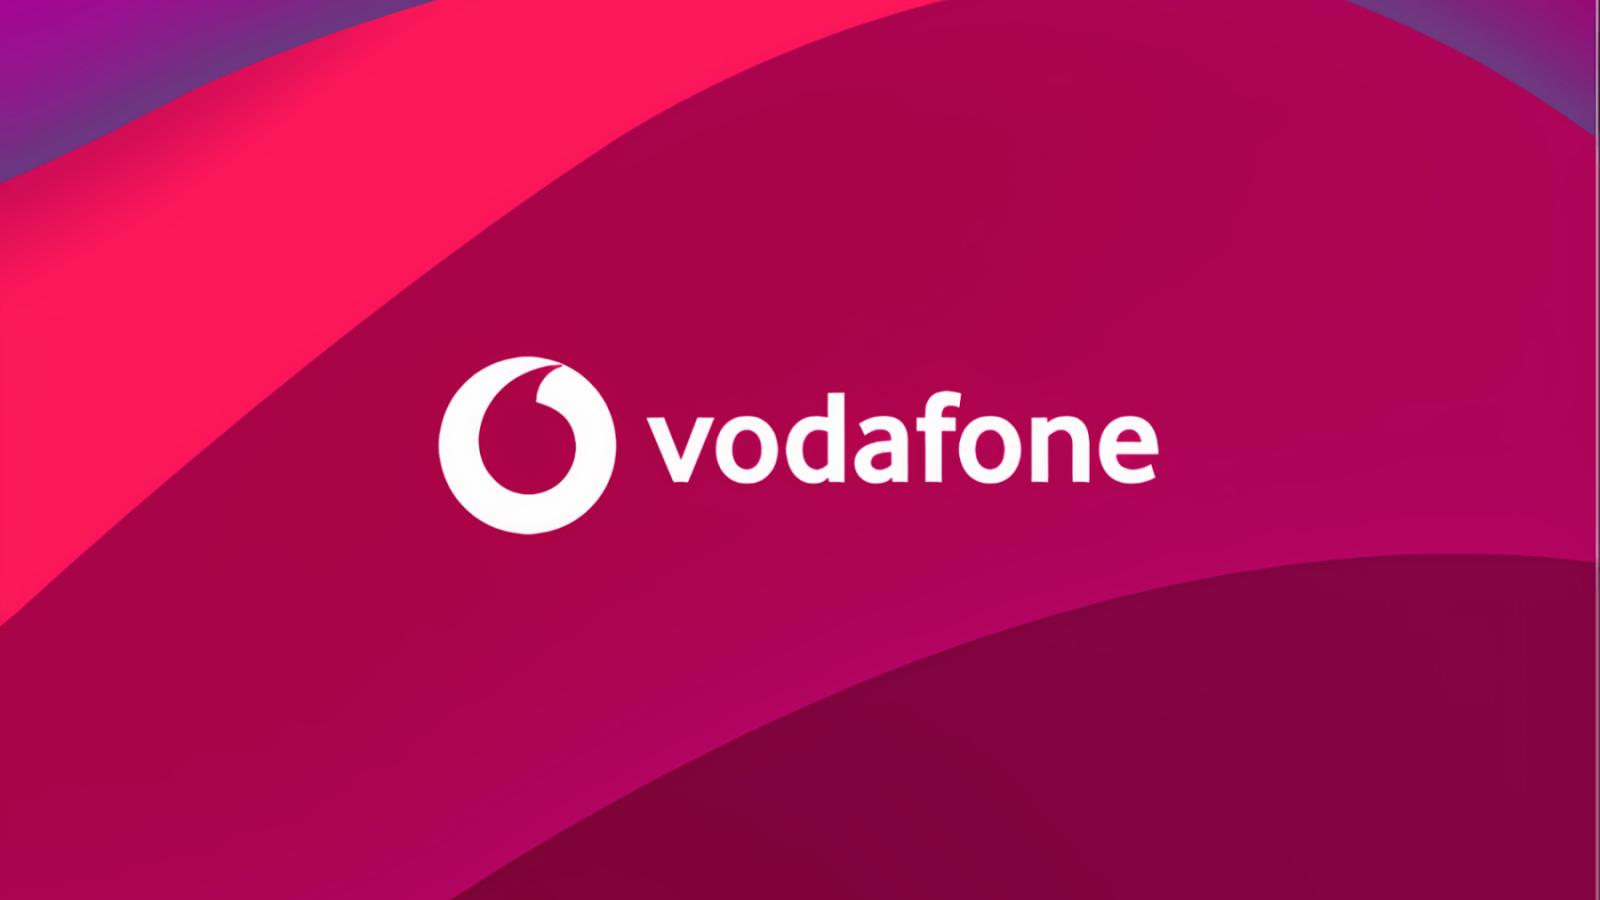 Vodafone experienta